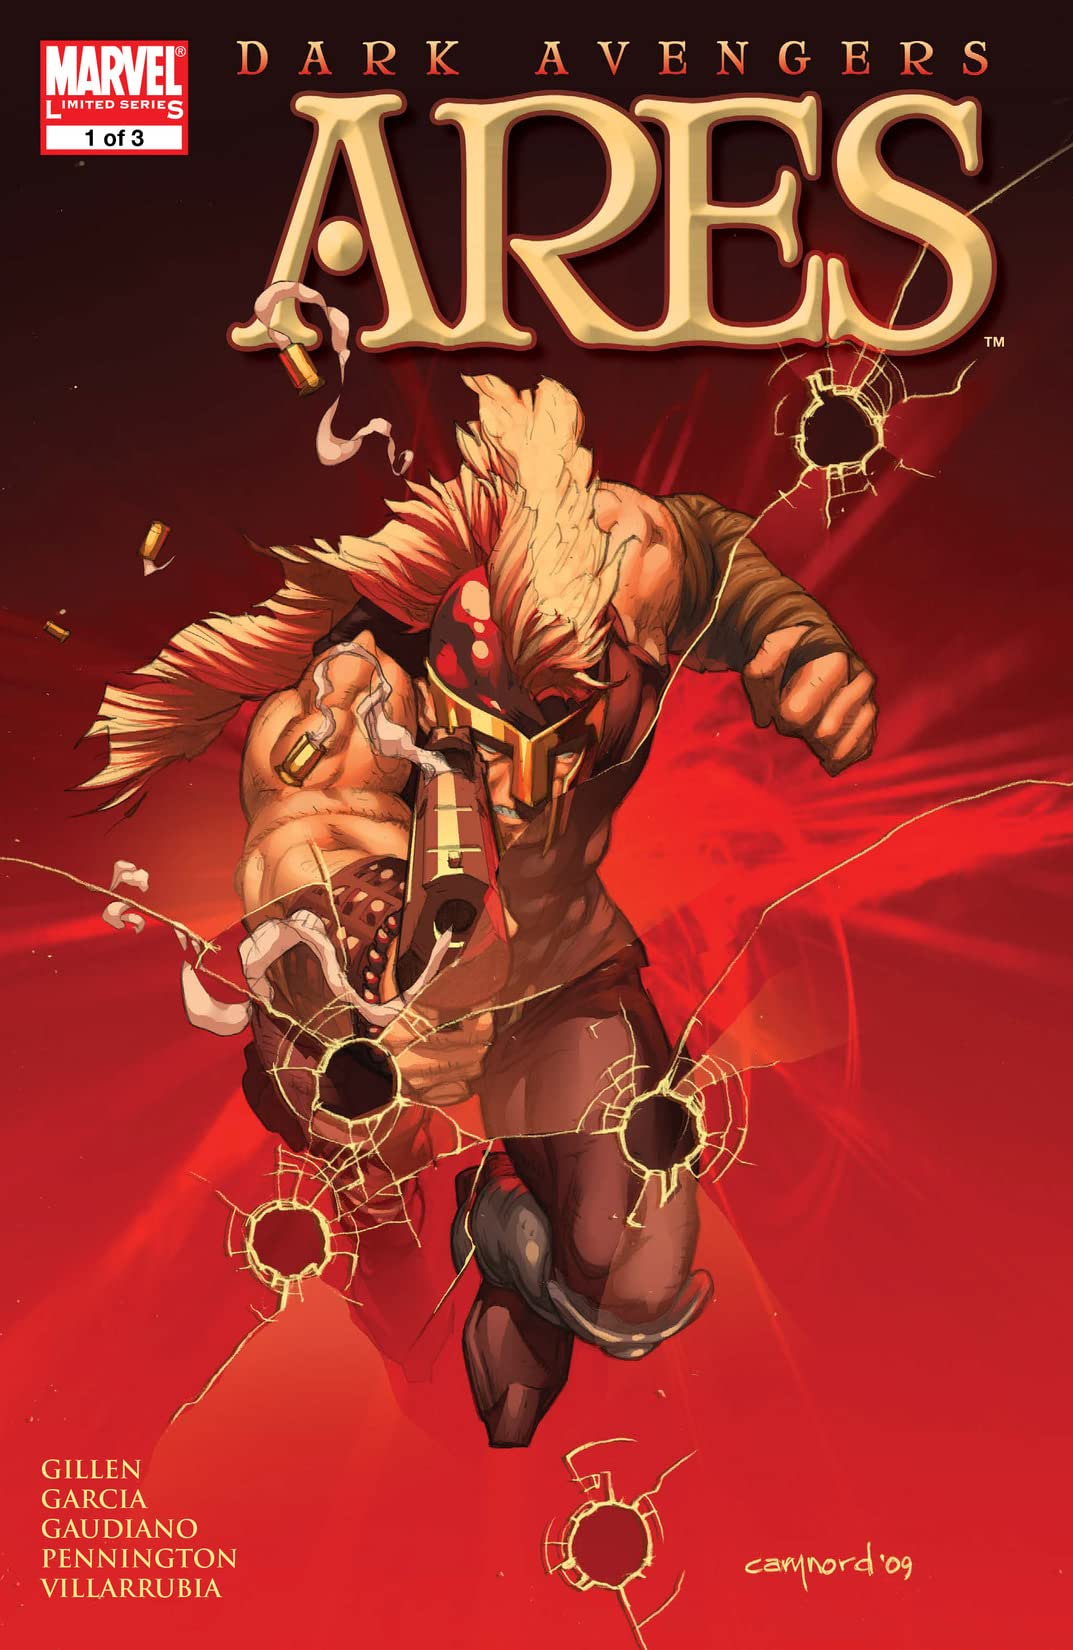 Dark Avengers: Ares (2009) #1 (of 3)